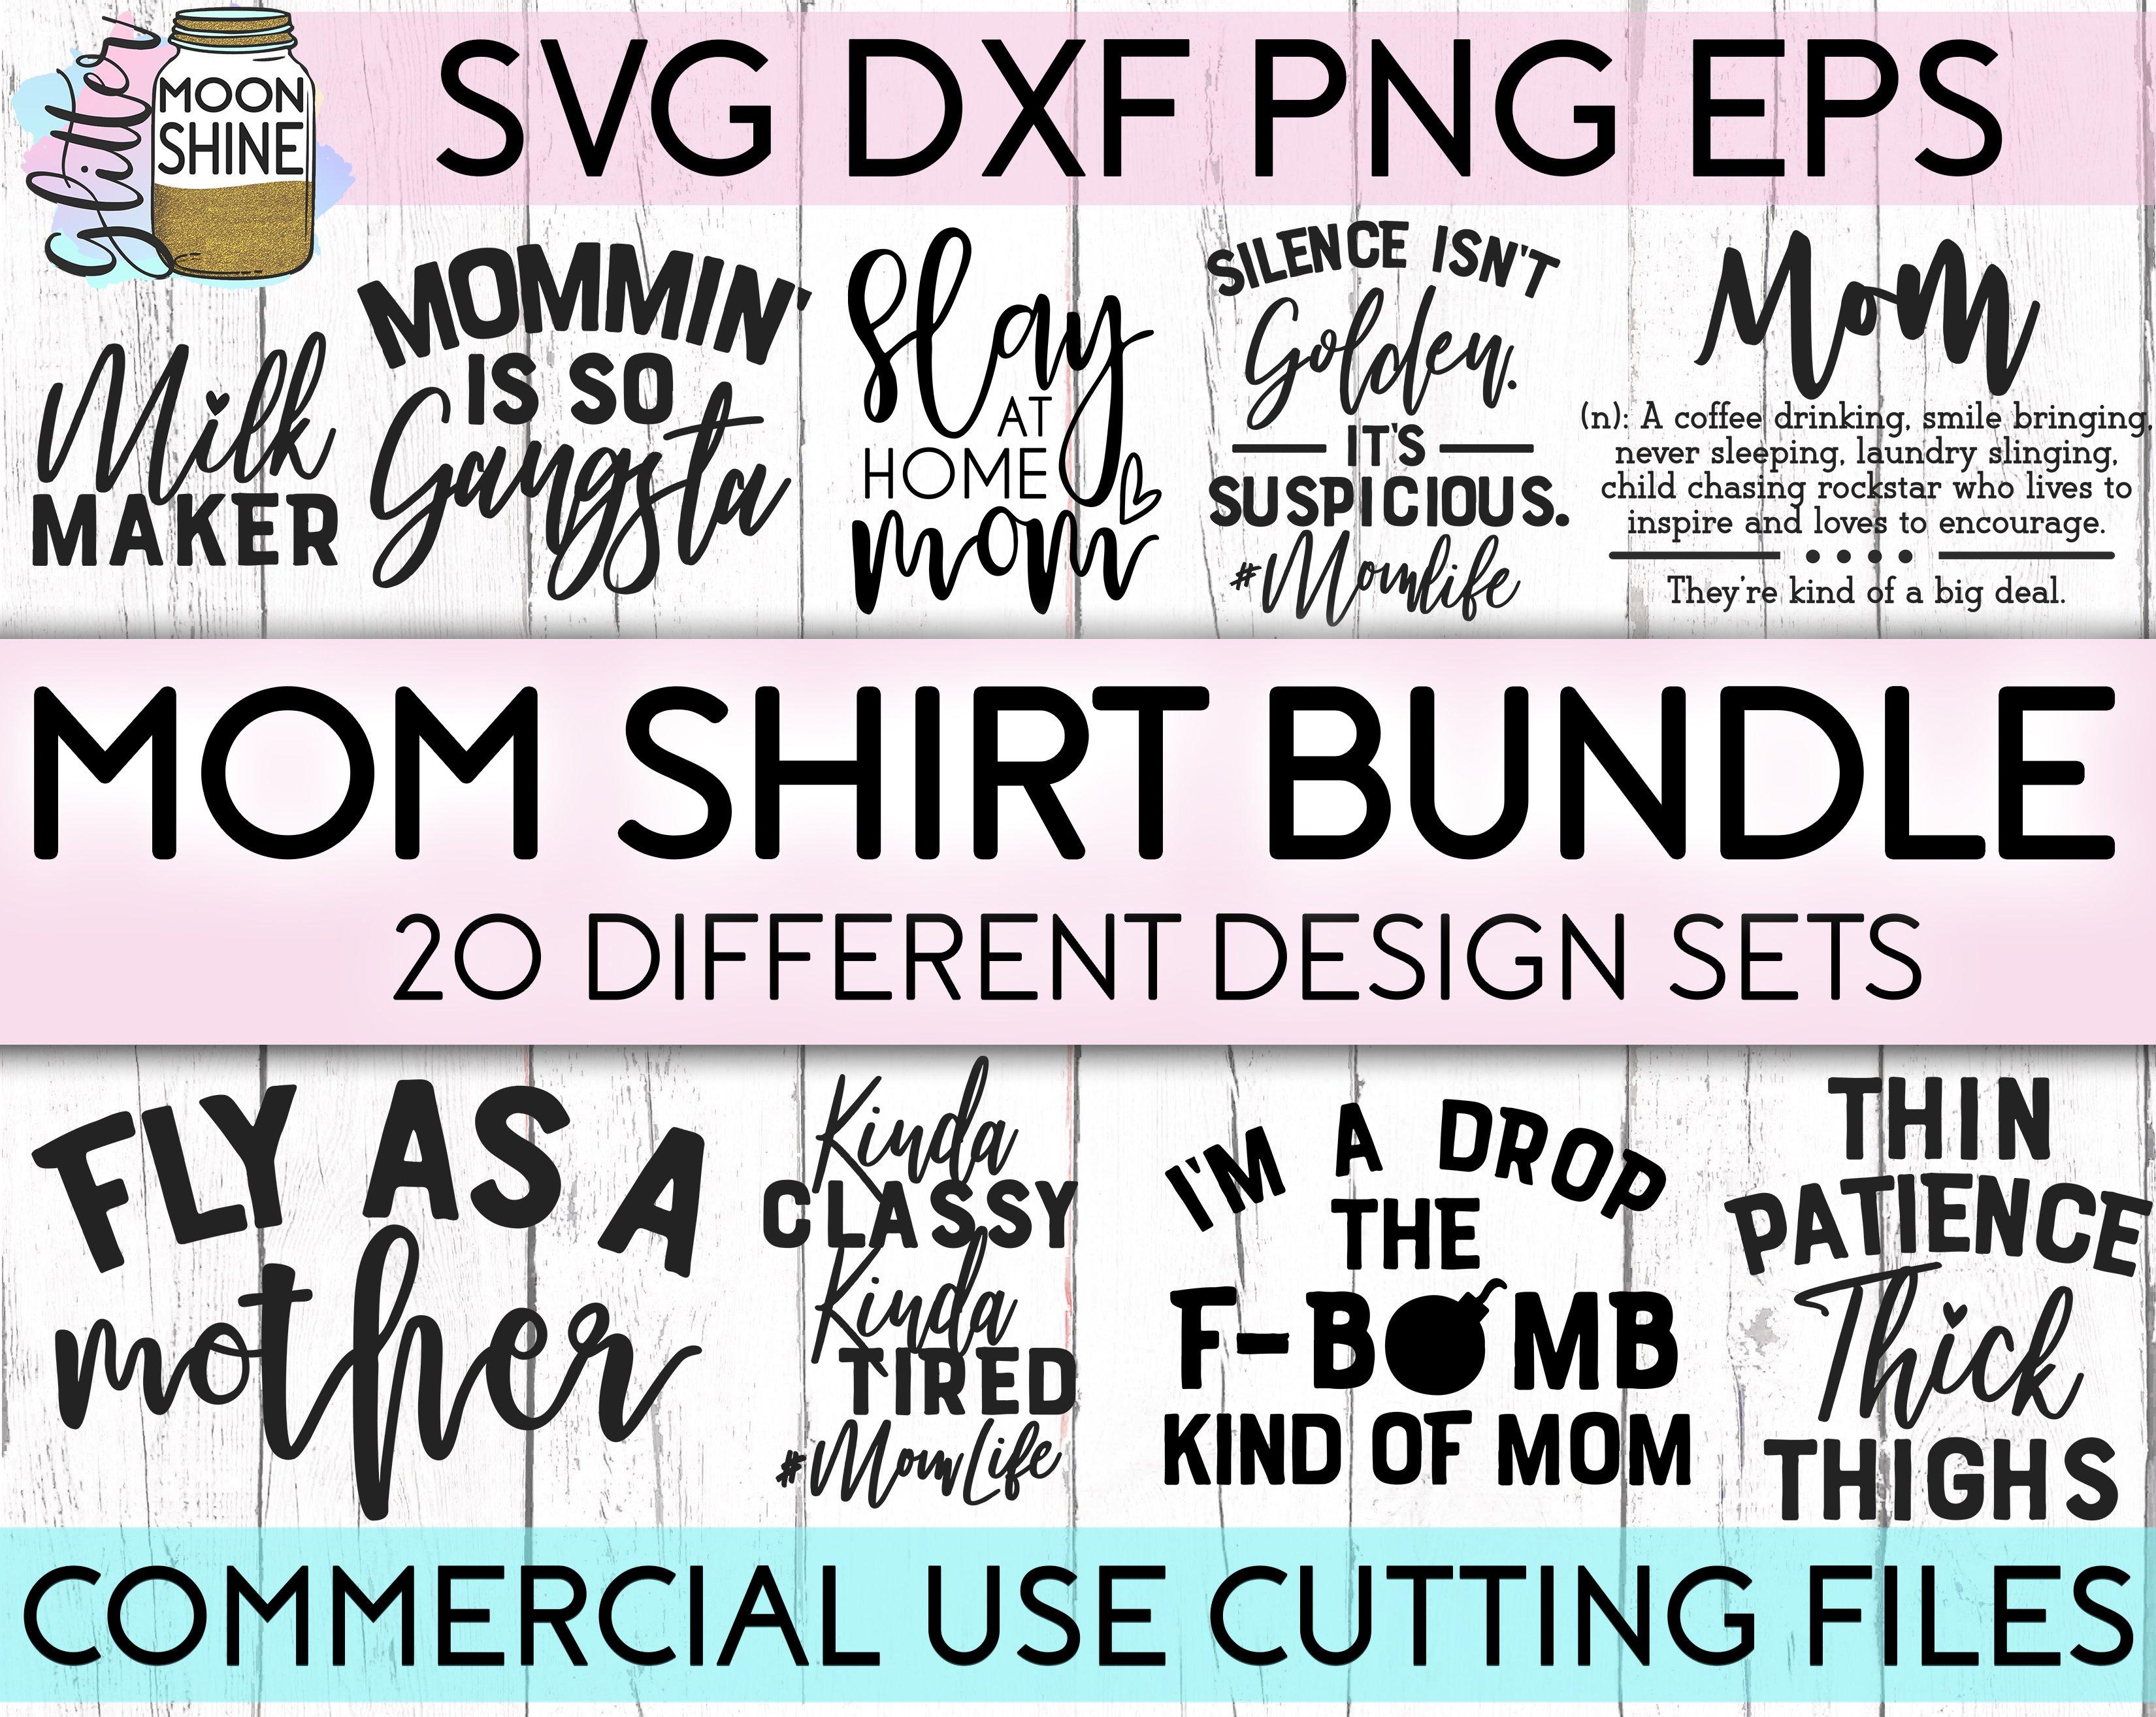 Mom Shirt Bundle Of 20 Svg Dxf Png Eps Cutting Files 90342 Cut Files Design Bundles